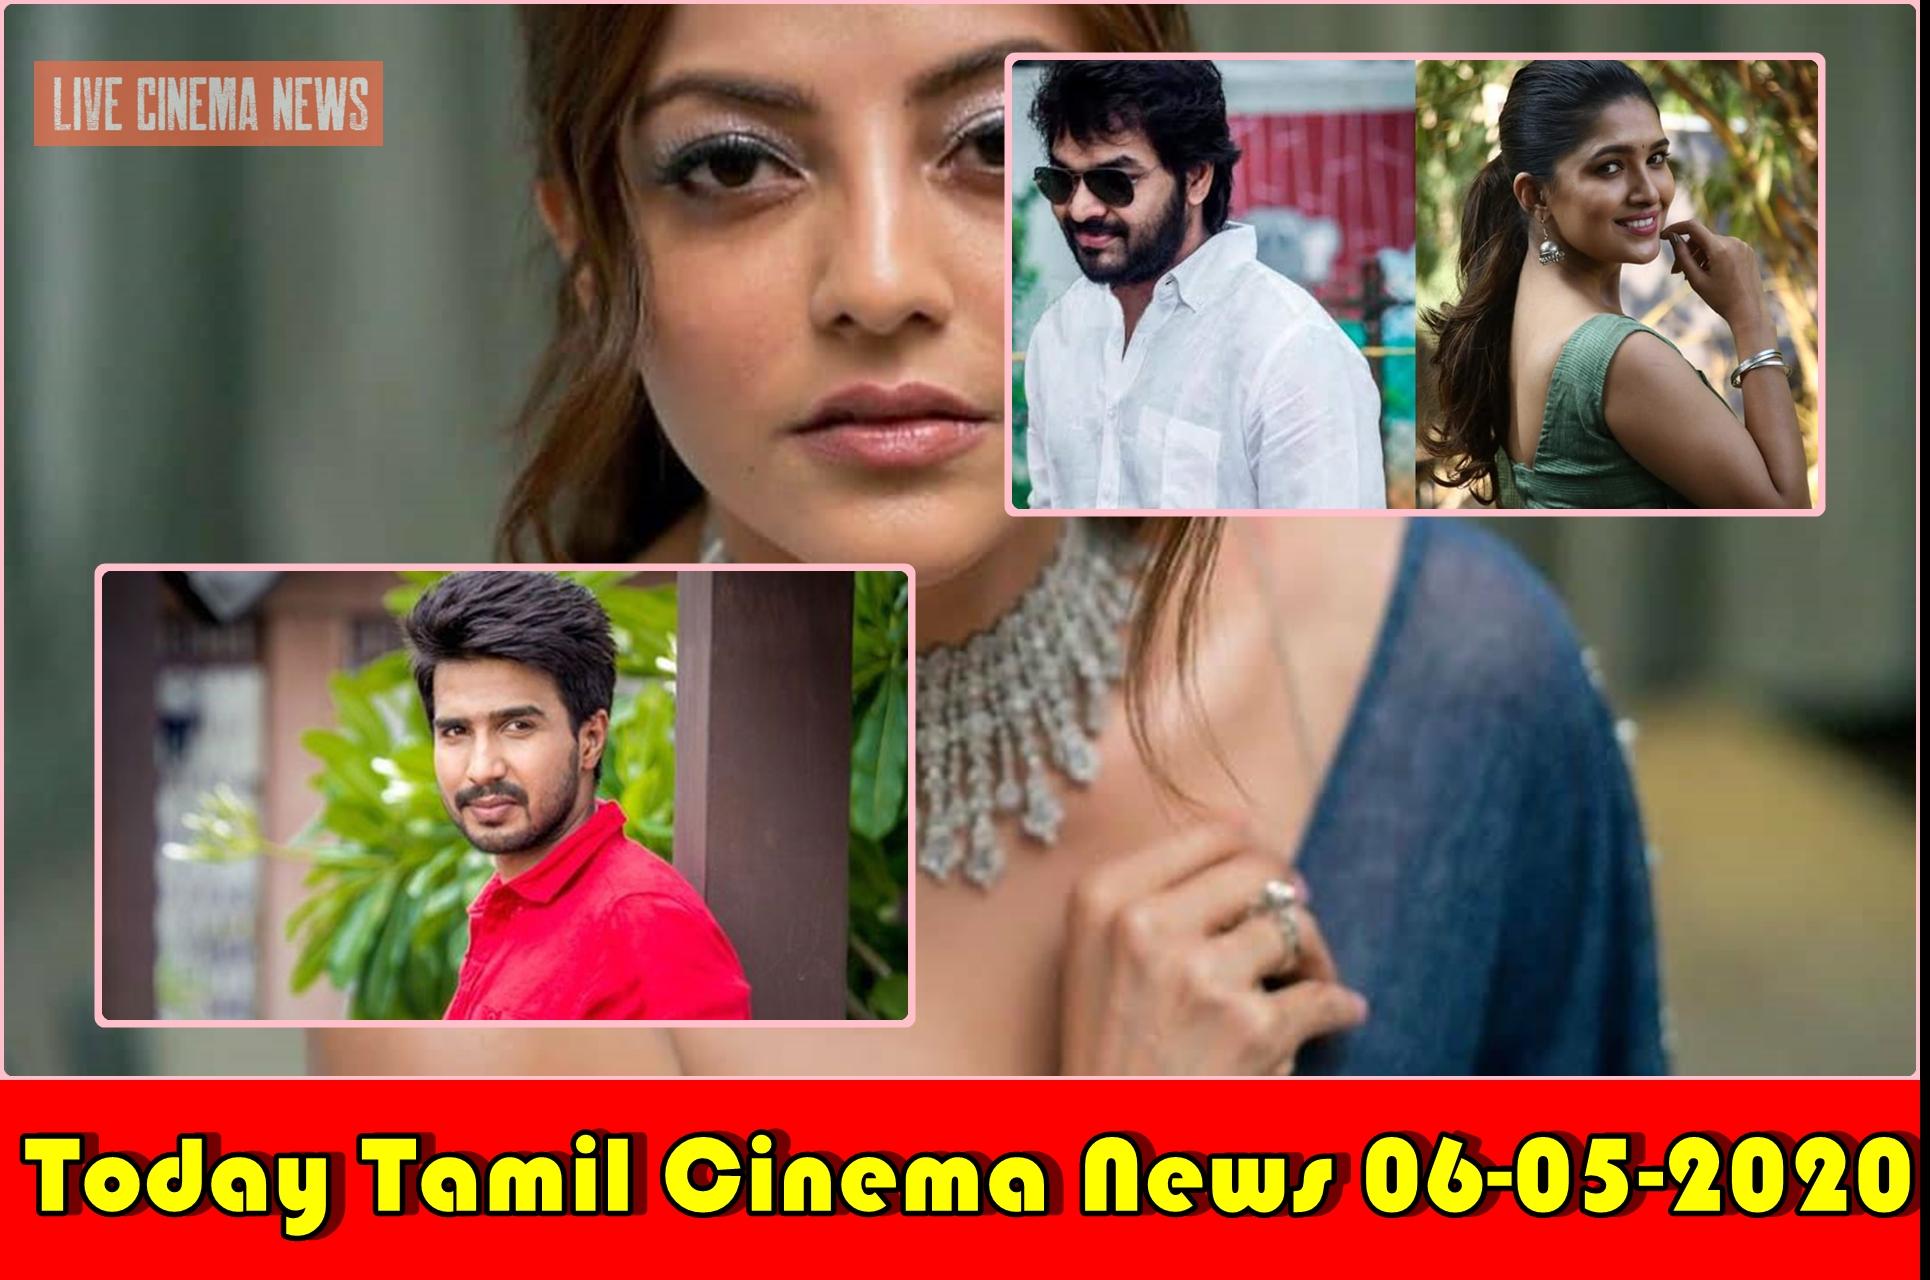 Today Tamil Cinema News 06-05-2020